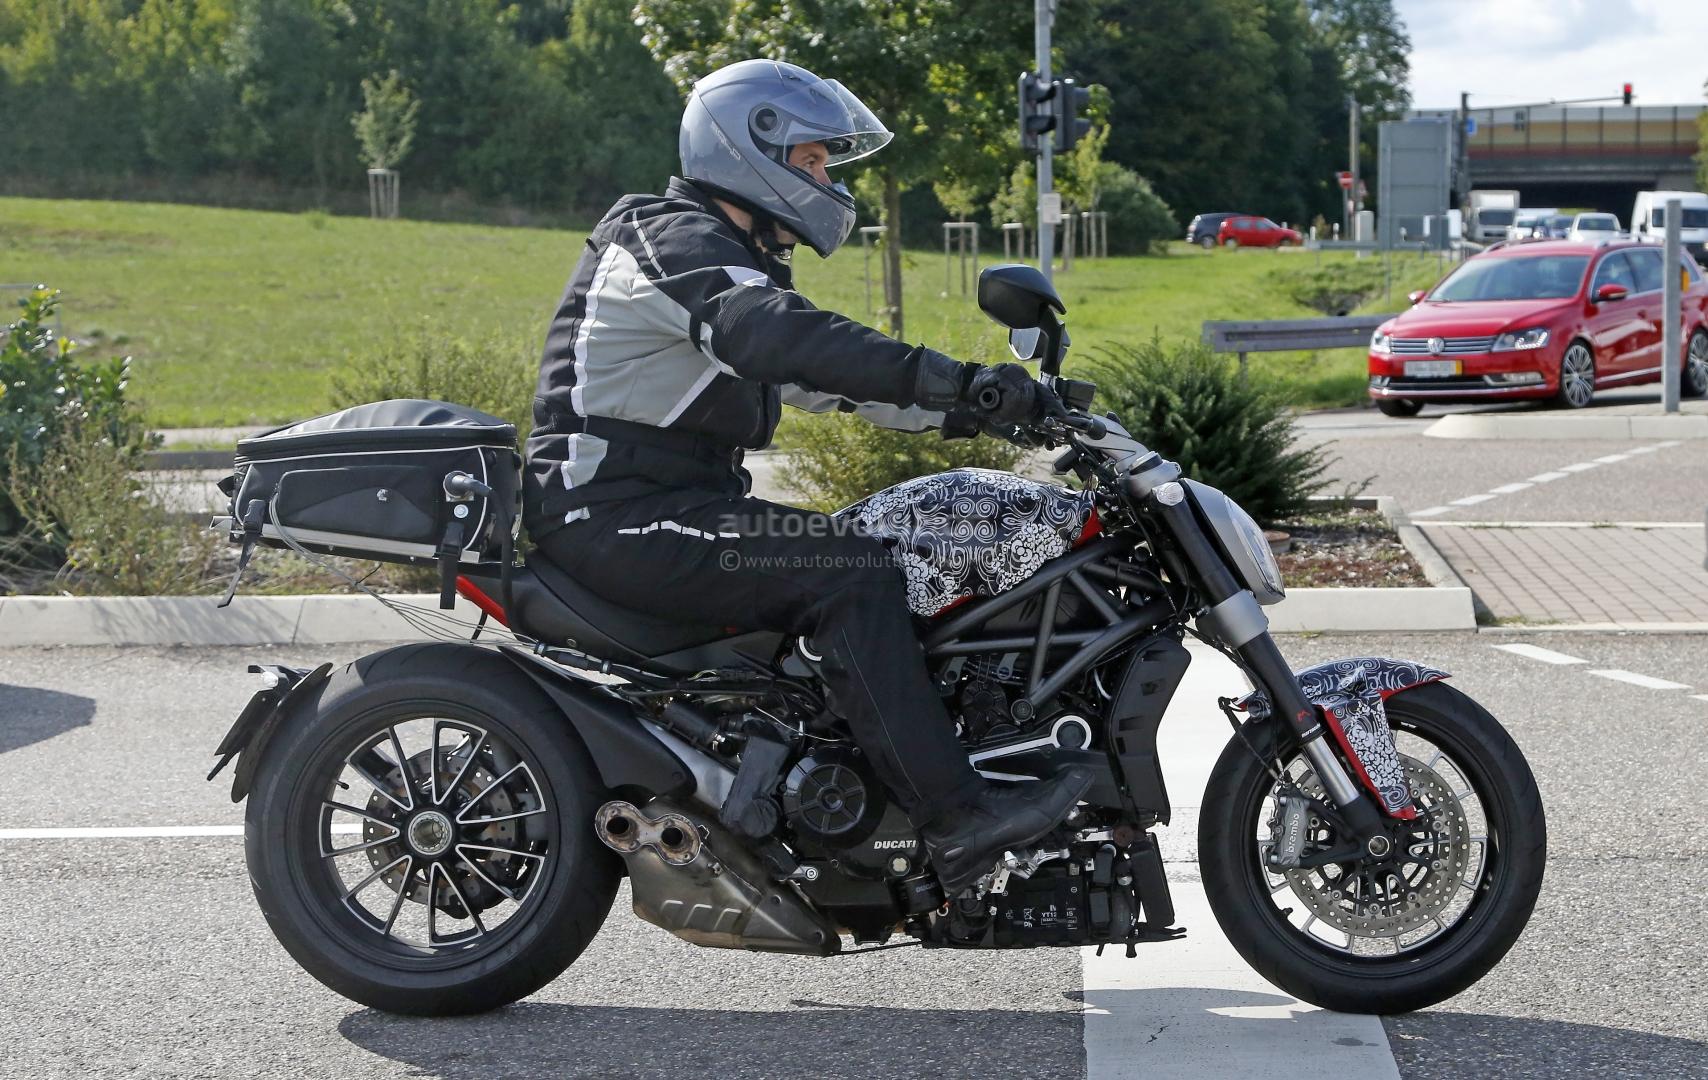 Belt Final Drive X Diavel Ducati Bike